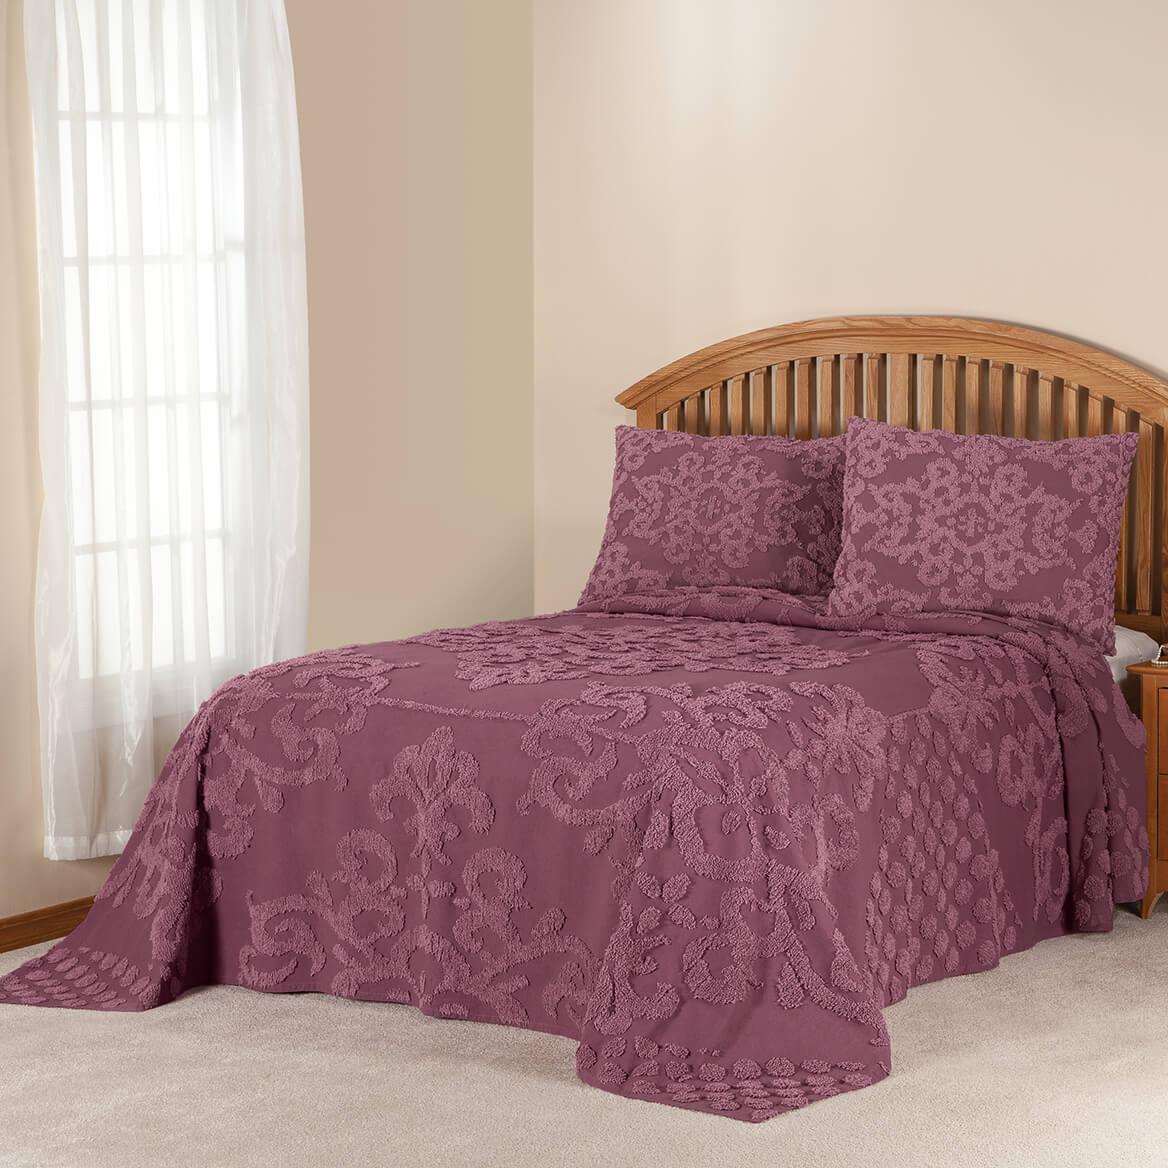 The-Florence-Chenille-Bedspread-by-OakRidgeTM thumbnail 5